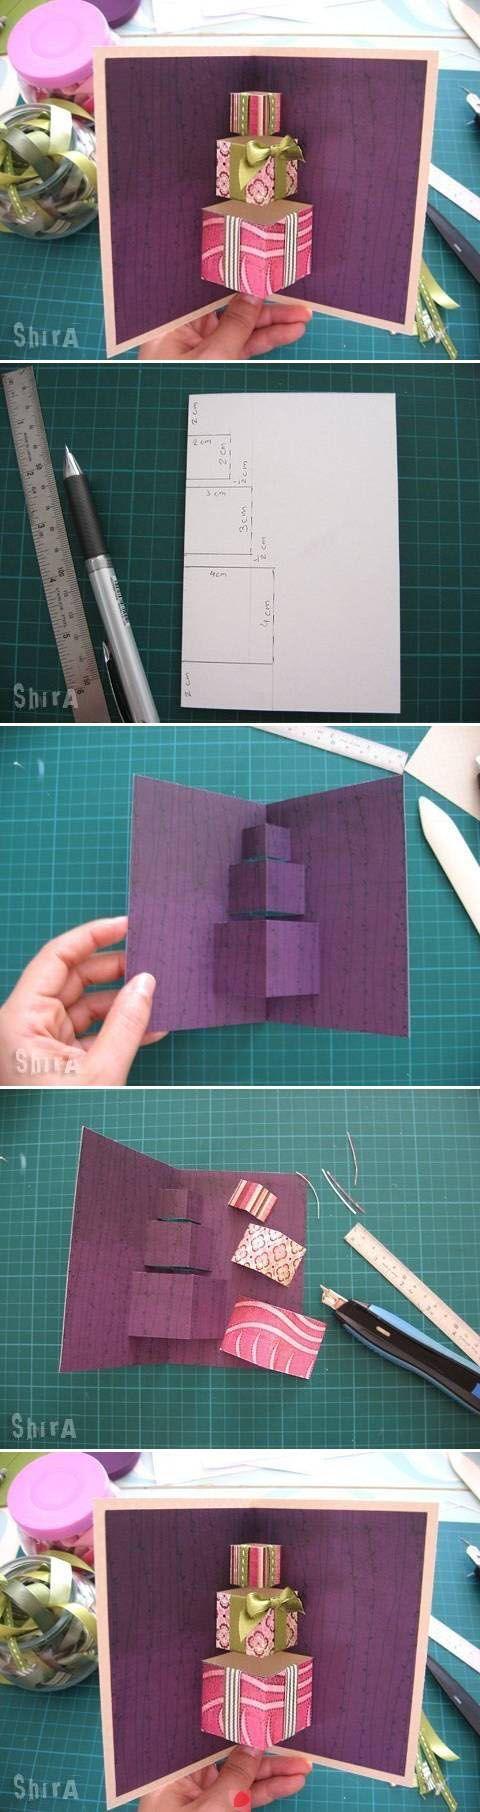 Scrapbook ideas pop up - 32 Handmade Birthday Card Ideas And Images Cardmakingcraft Ideasscrapbookingkirigamiholidayspop Up